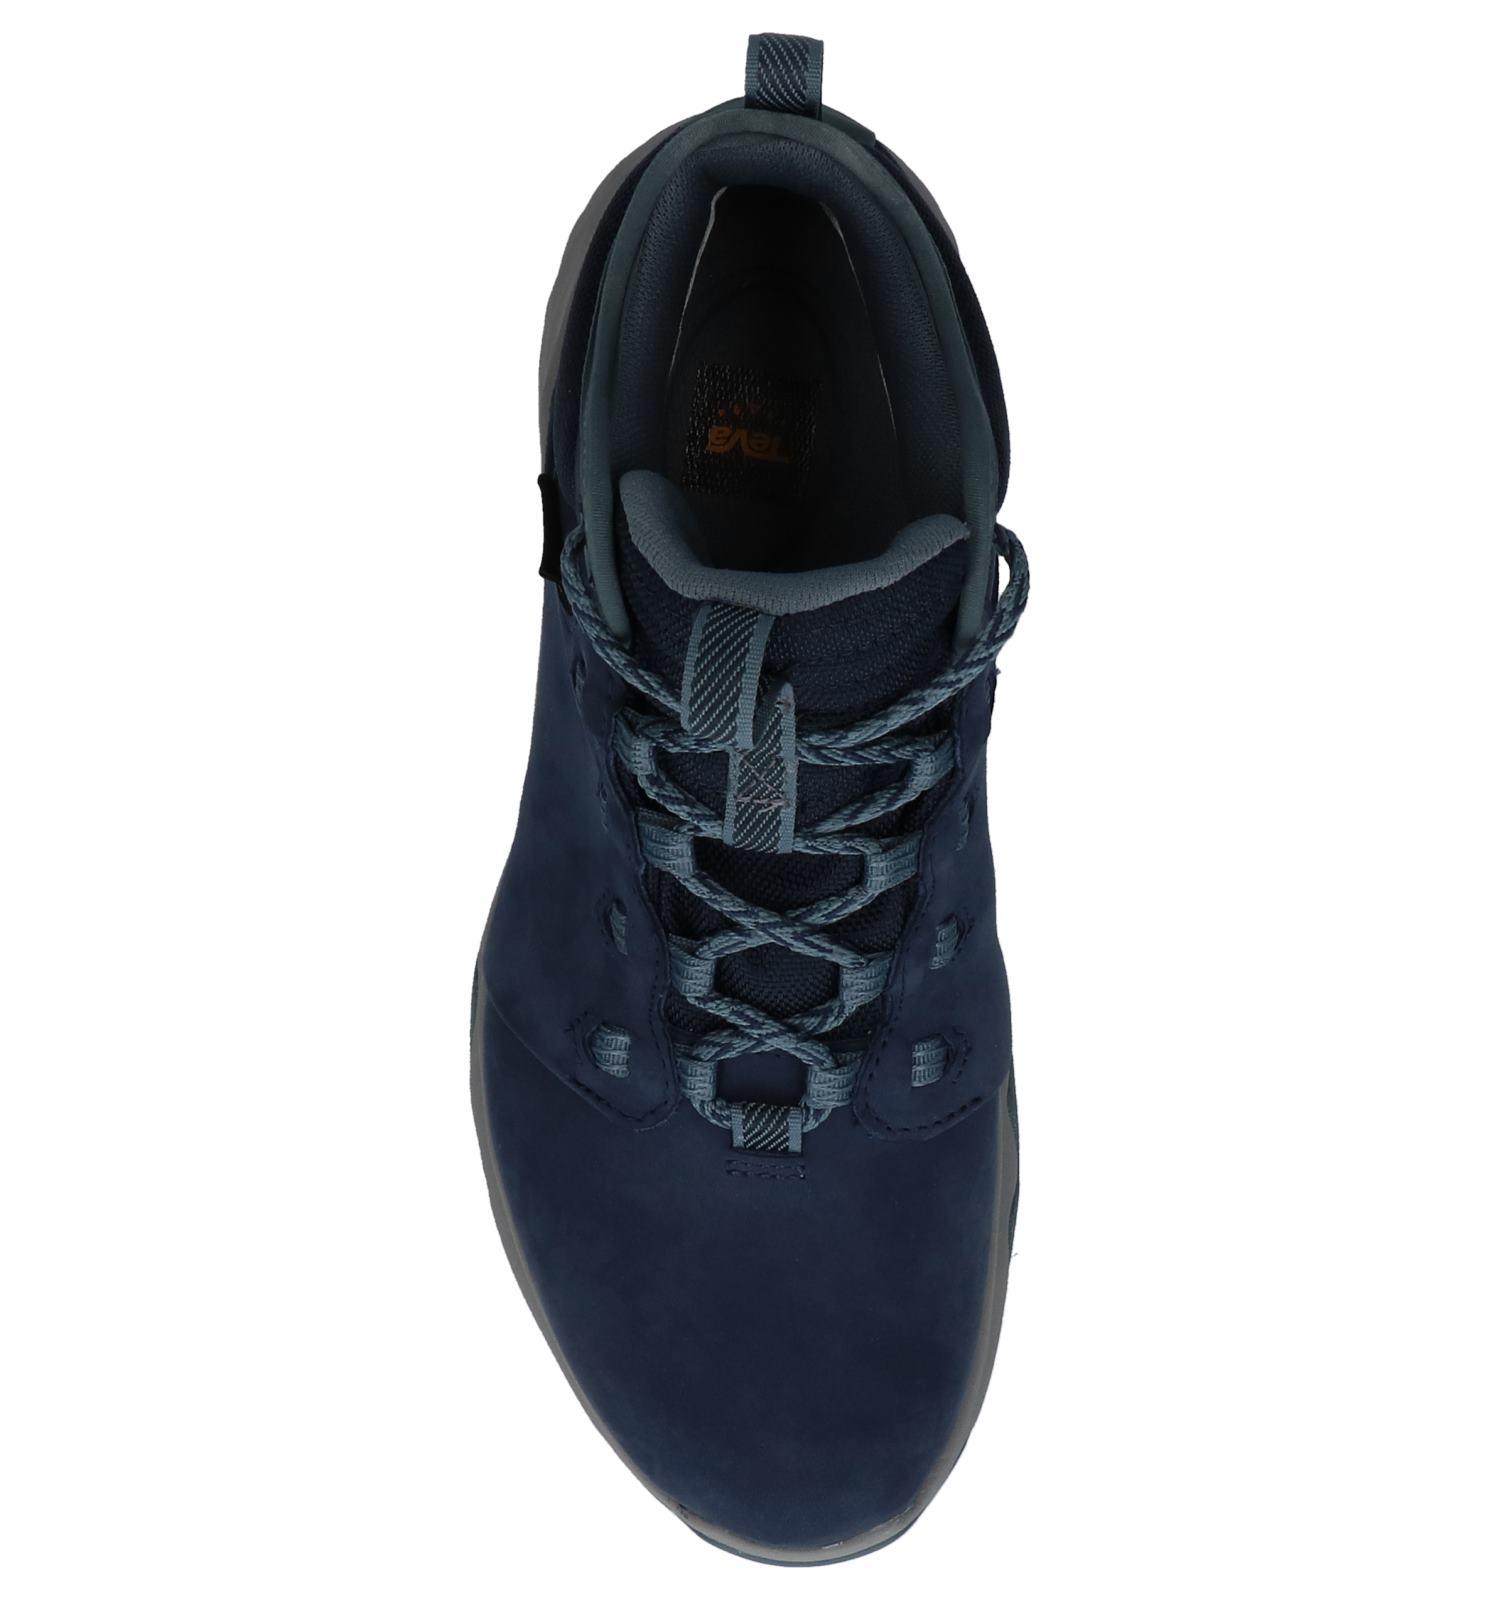 Arrowood Teva Donker Donker Boots Blauwe Boots Teva Arrowood Blauwe Teva Donker Arrowood yf7g6Yb